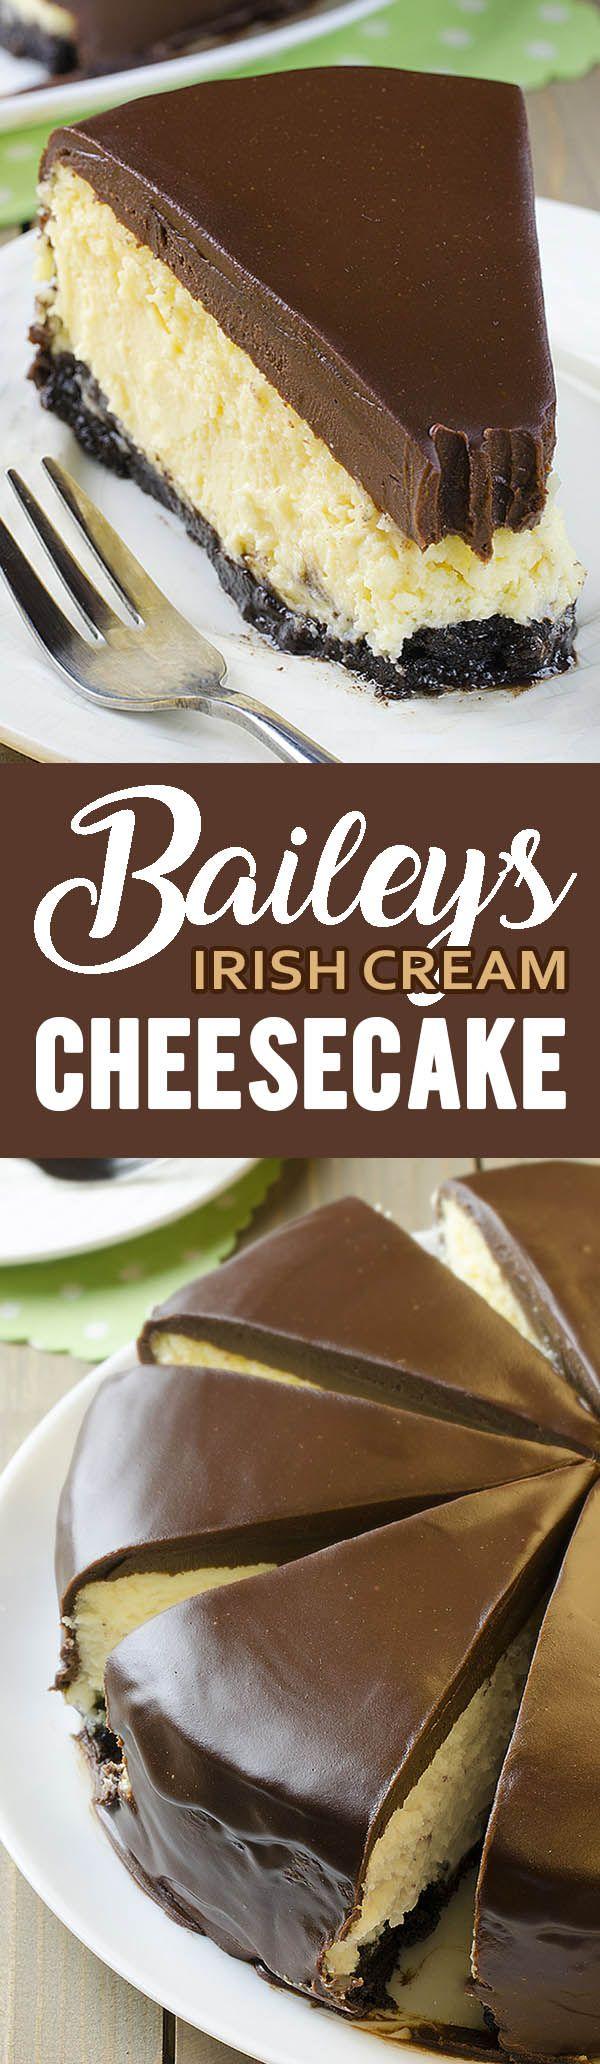 bailey is opskrift